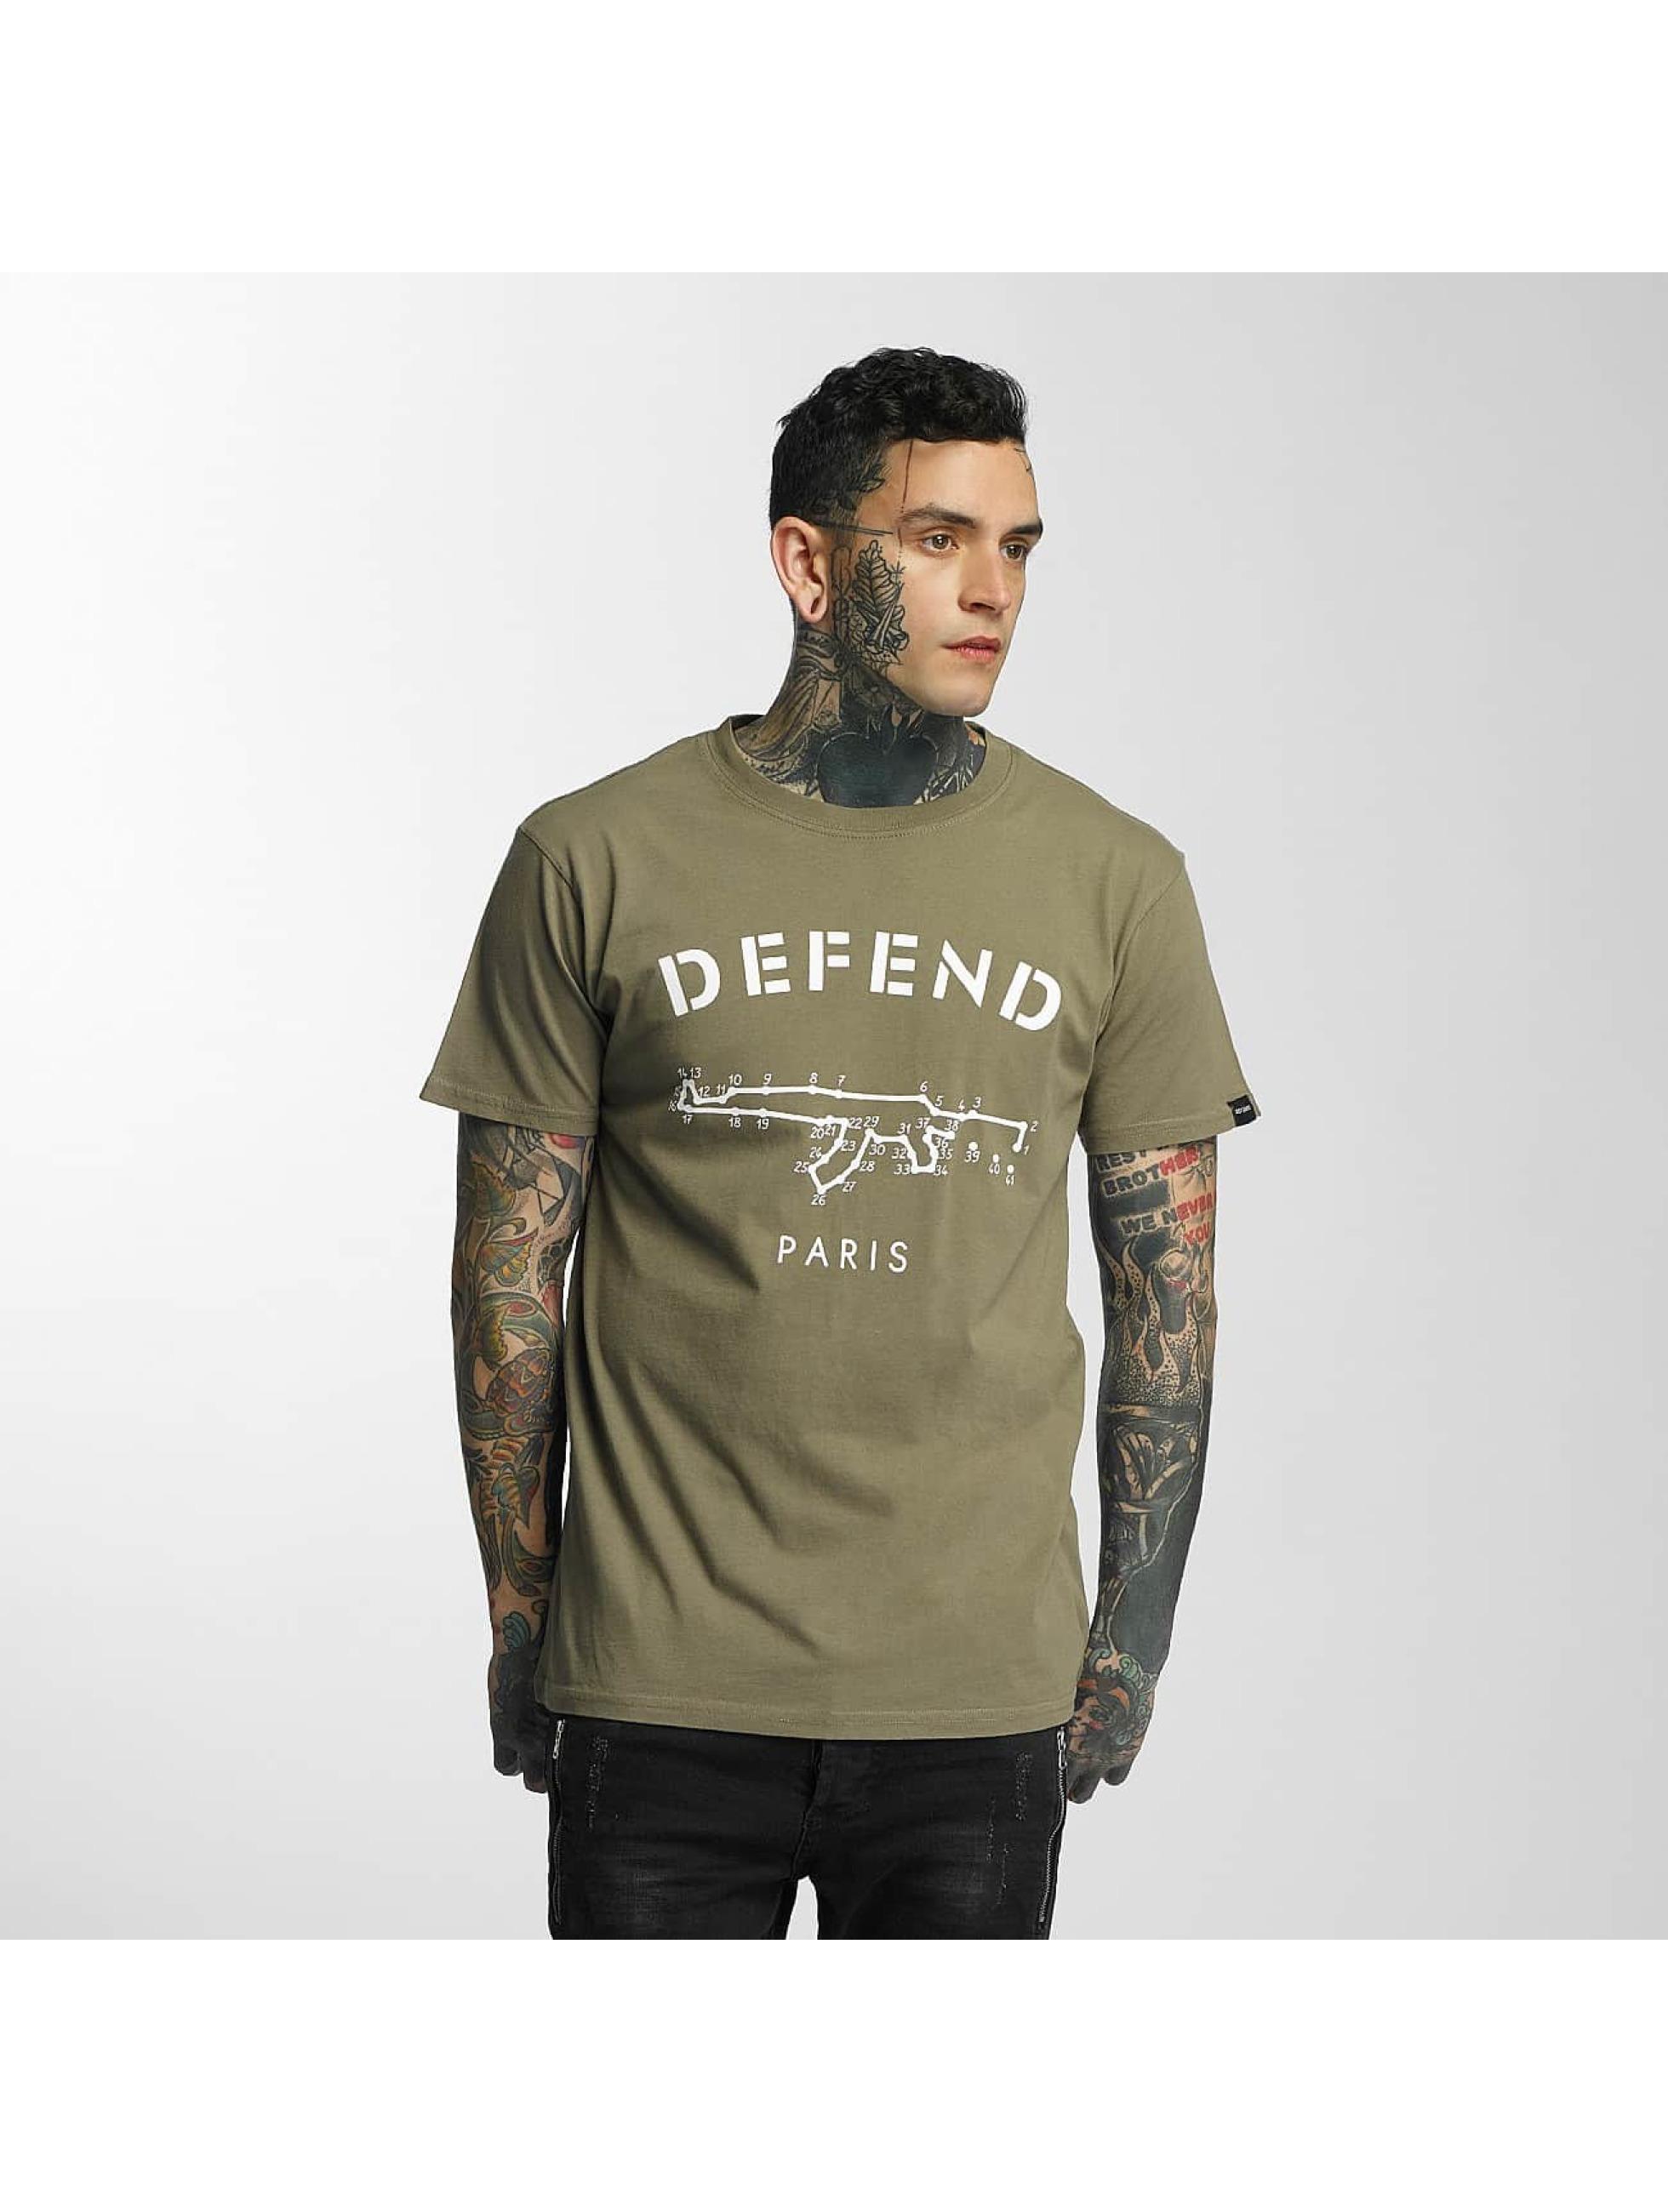 Defend Paris T-Shirt Linked khaki